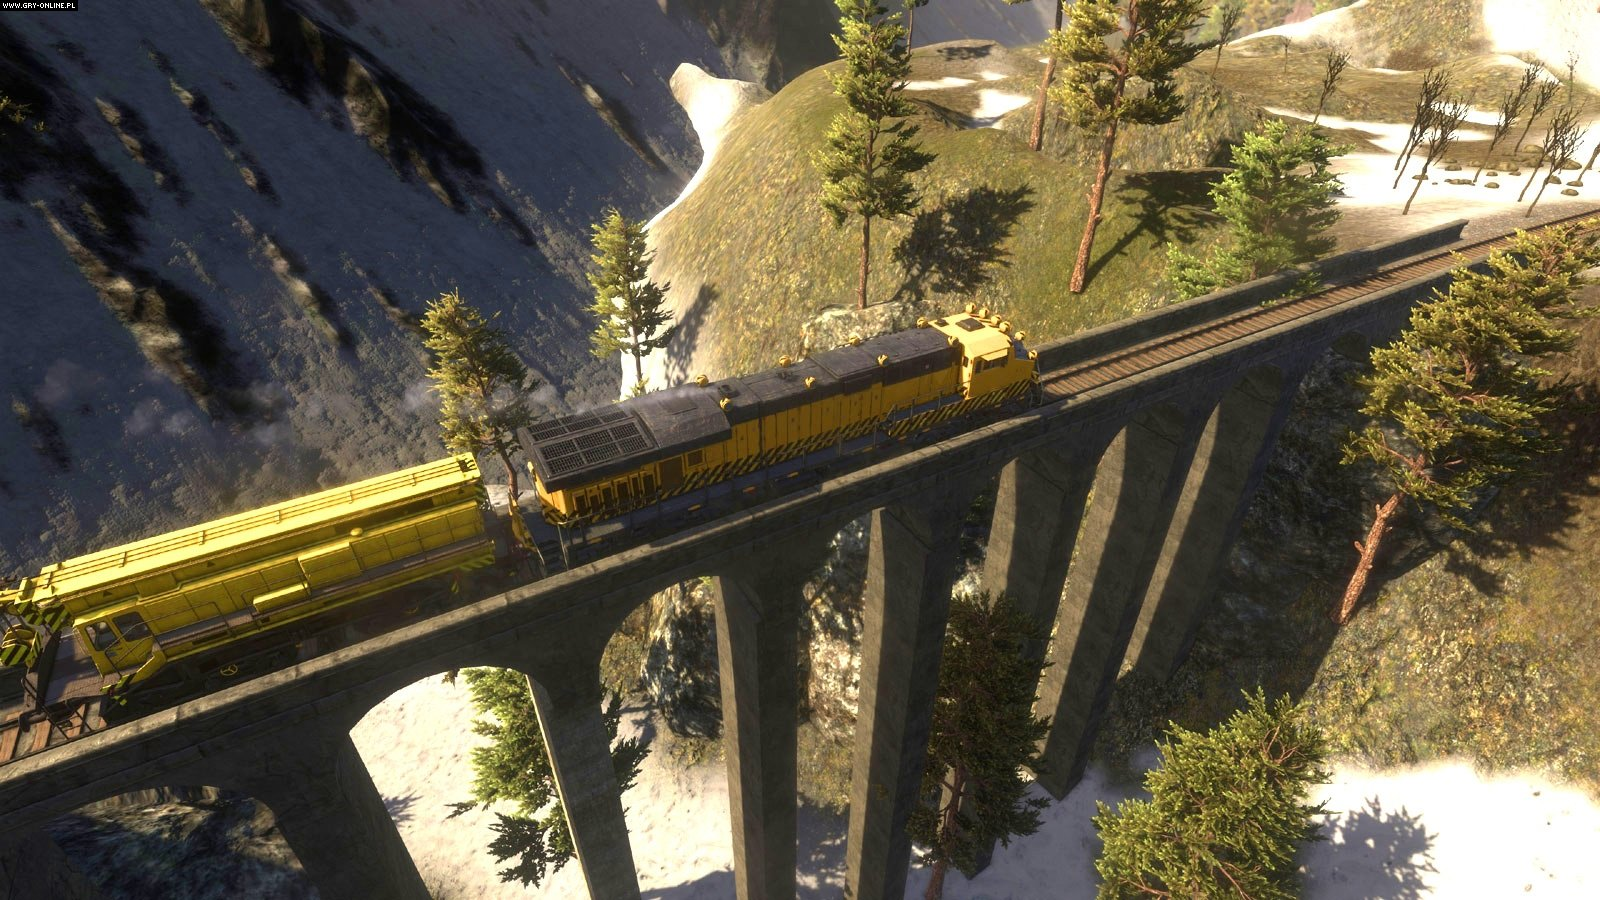 Train Mechanic Simulator 2017 PC Games Image 2/38, Si7 Studio, PlayWay